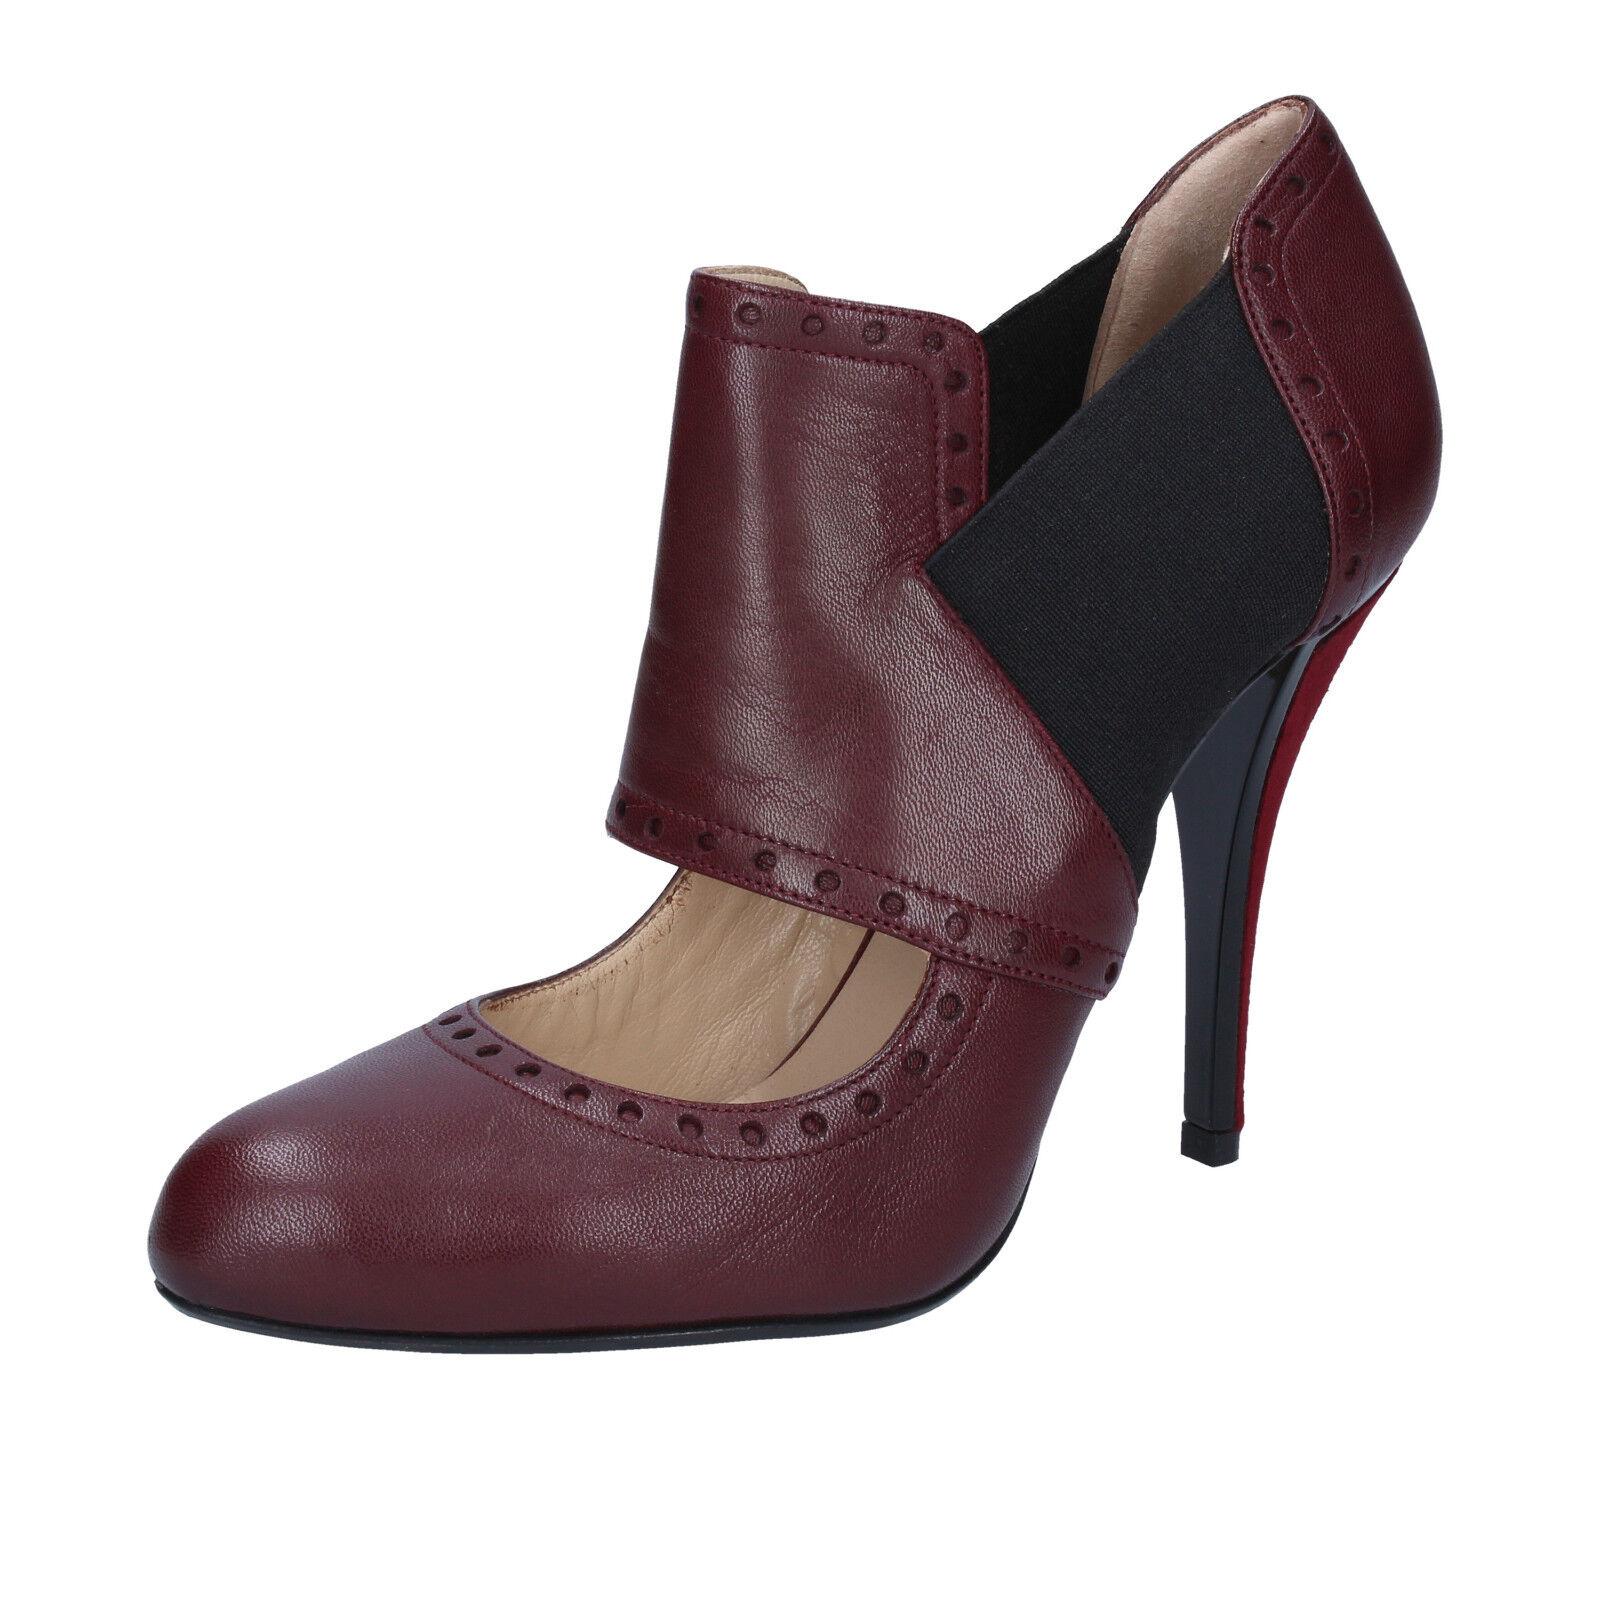 Damen MARRA schuhe GIANNI MARRA Damen 36,5 EU stiefeletten burgund leder textil BY795-36,5 bdbb90